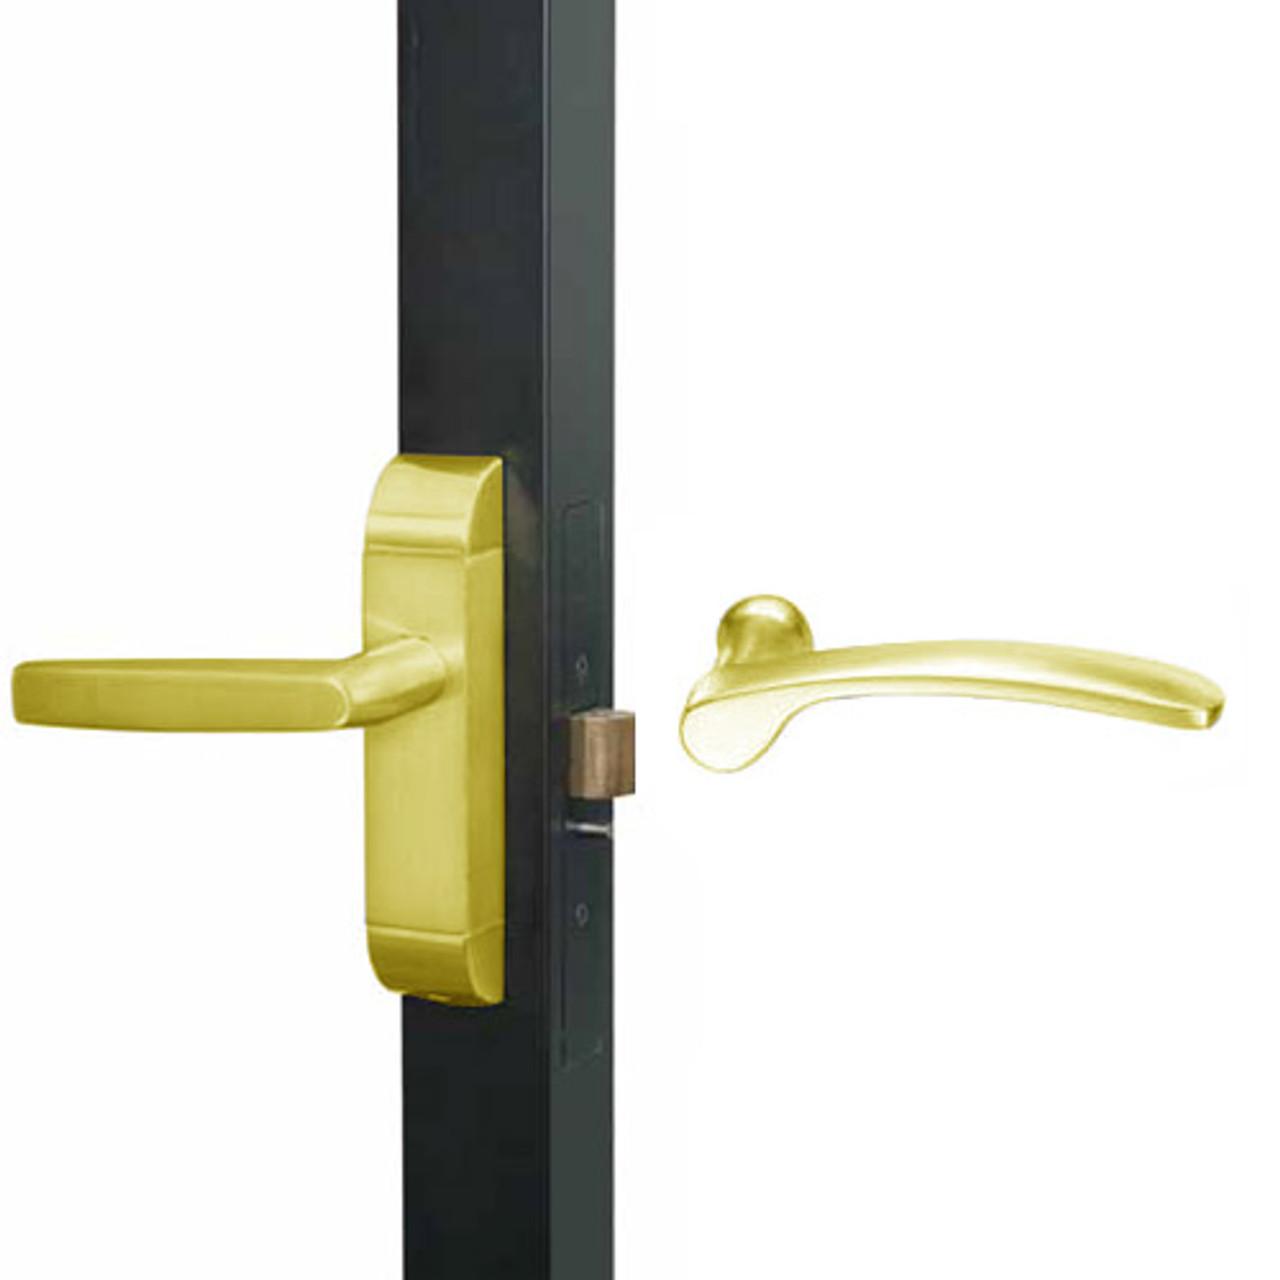 4600M-MN-642-US3 Adams Rite MN Designer Deadlatch handle in Bright Brass Finish